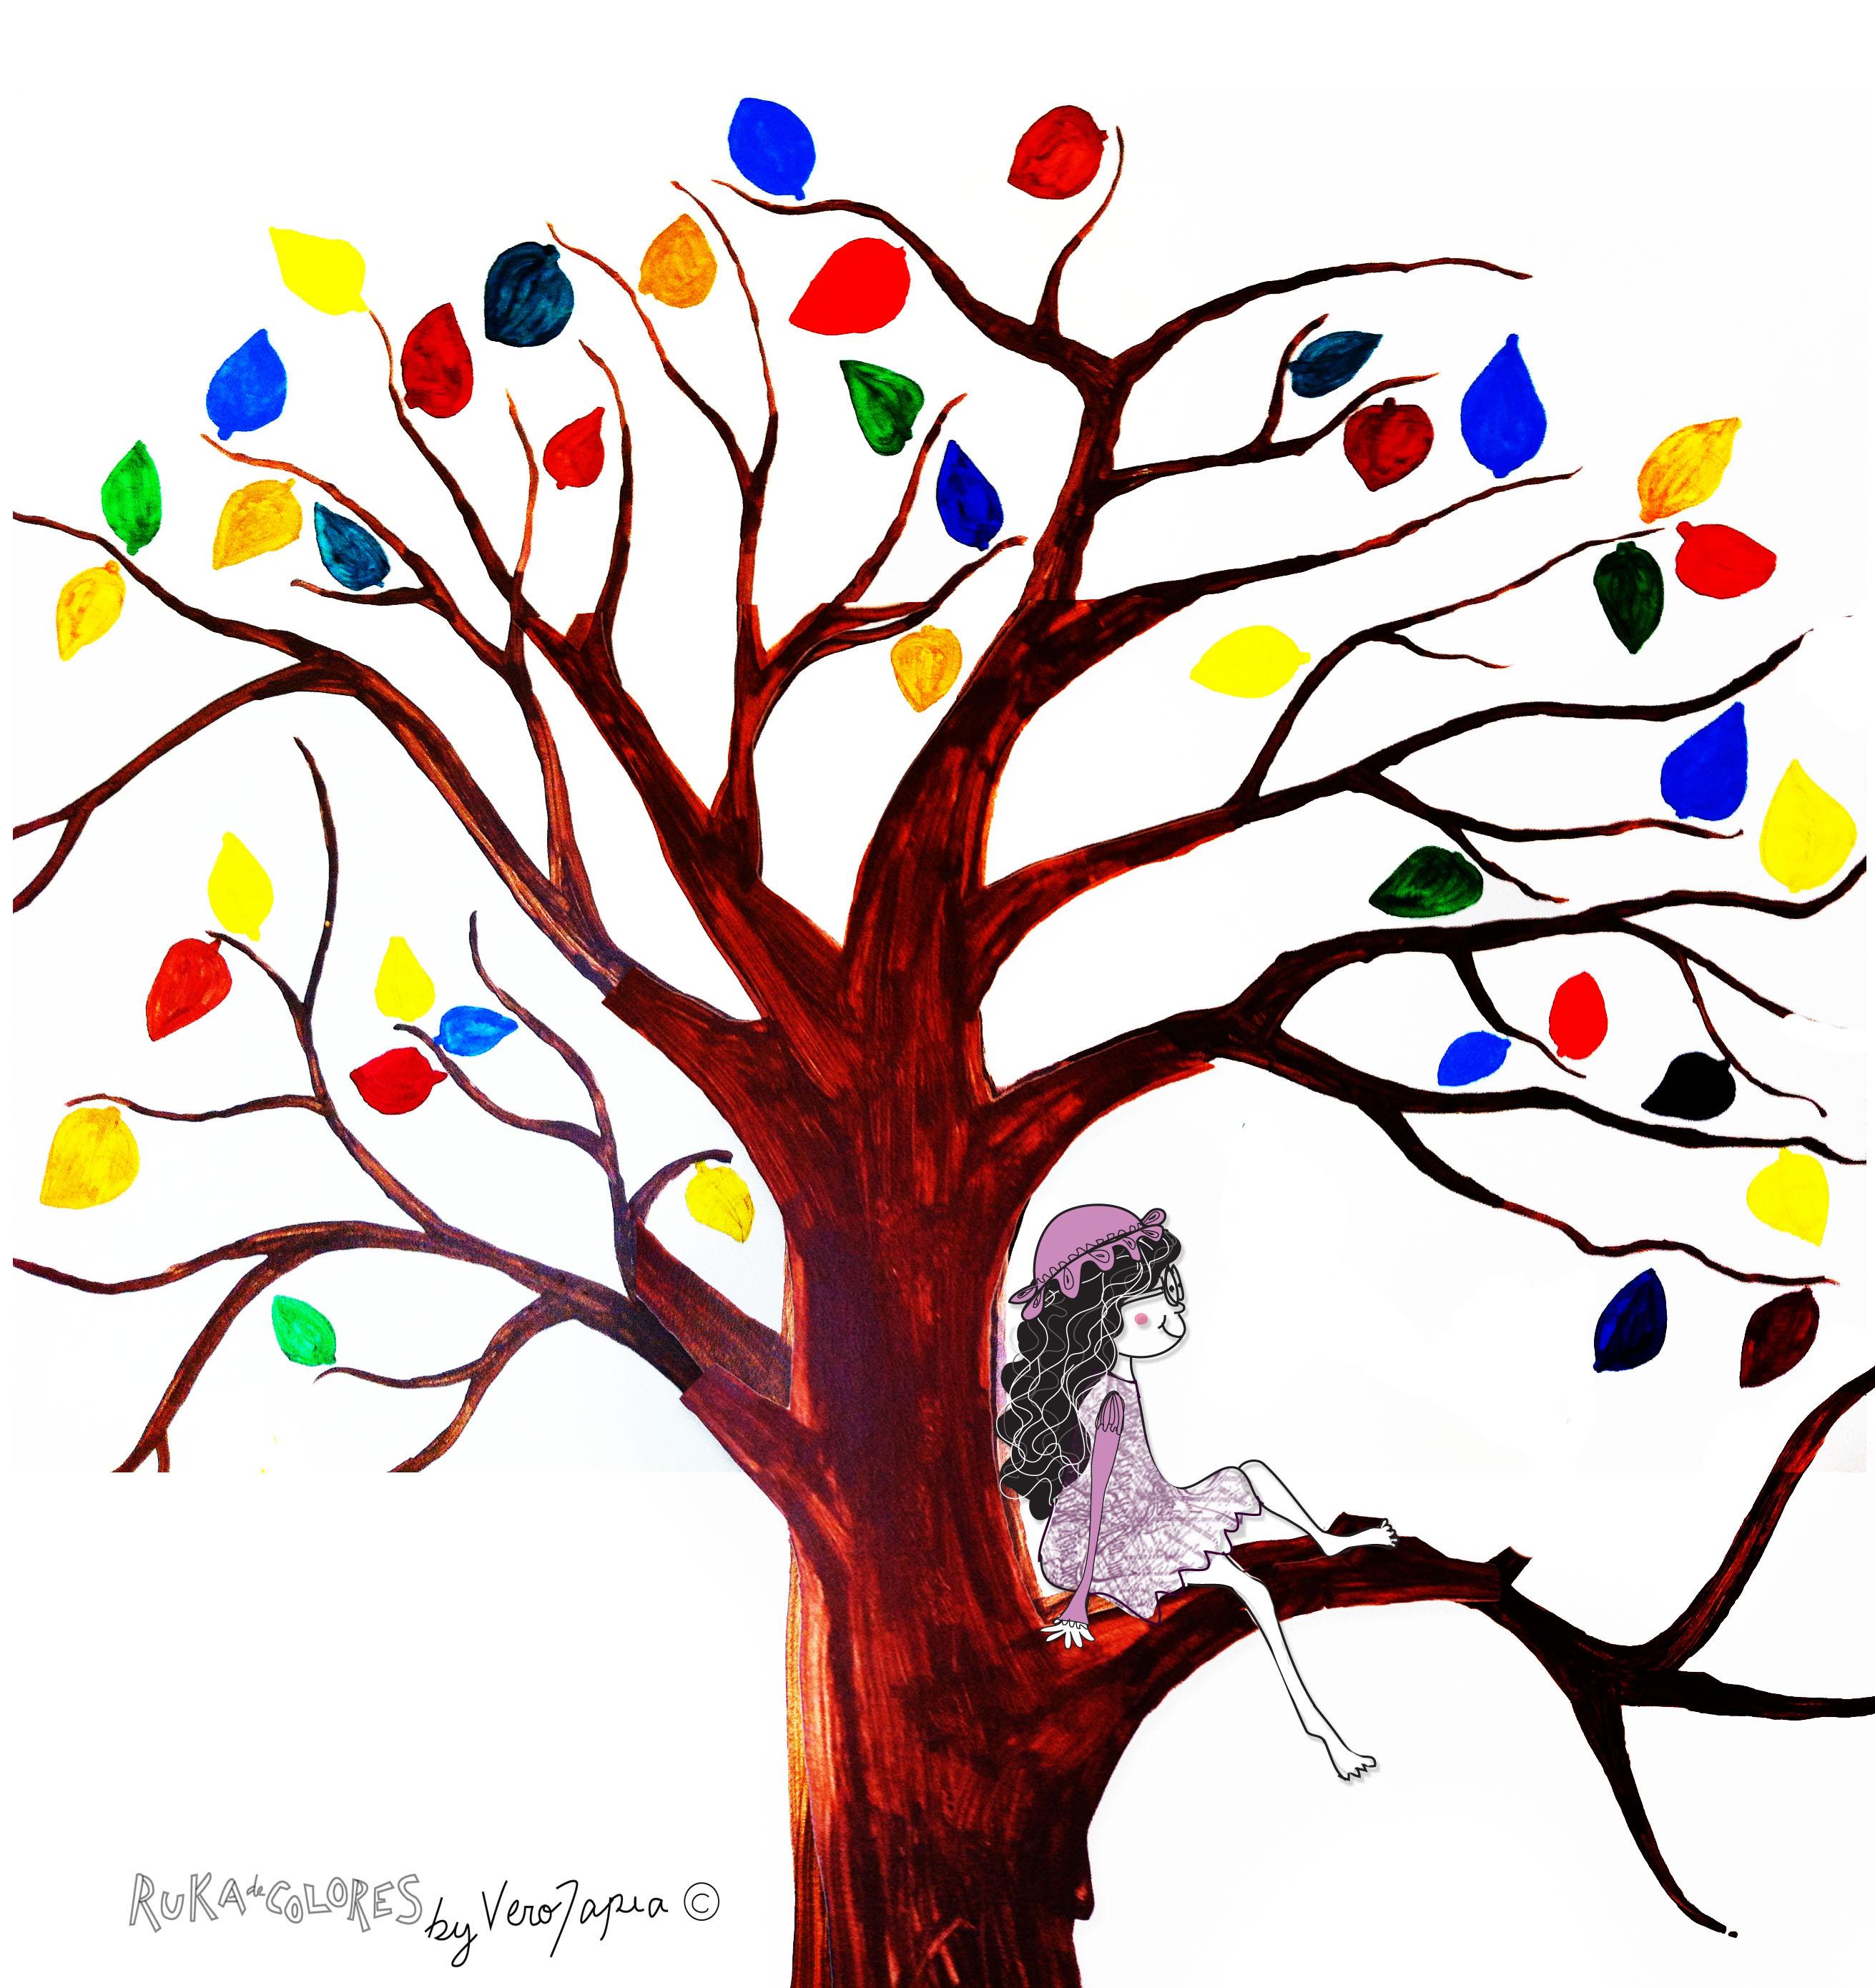 Primavera  Ruka de Colores